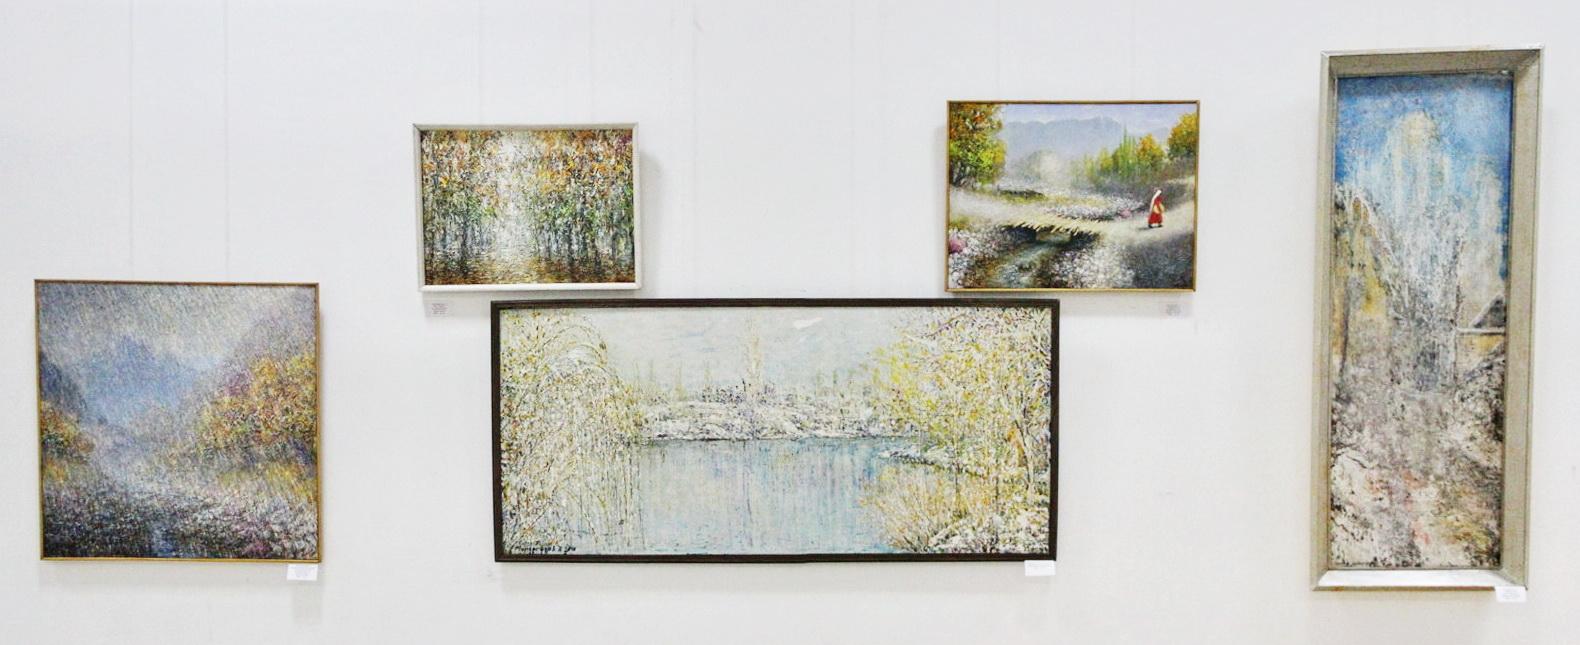 Мирсагатов Анвар. Экспозиция картин. 2020